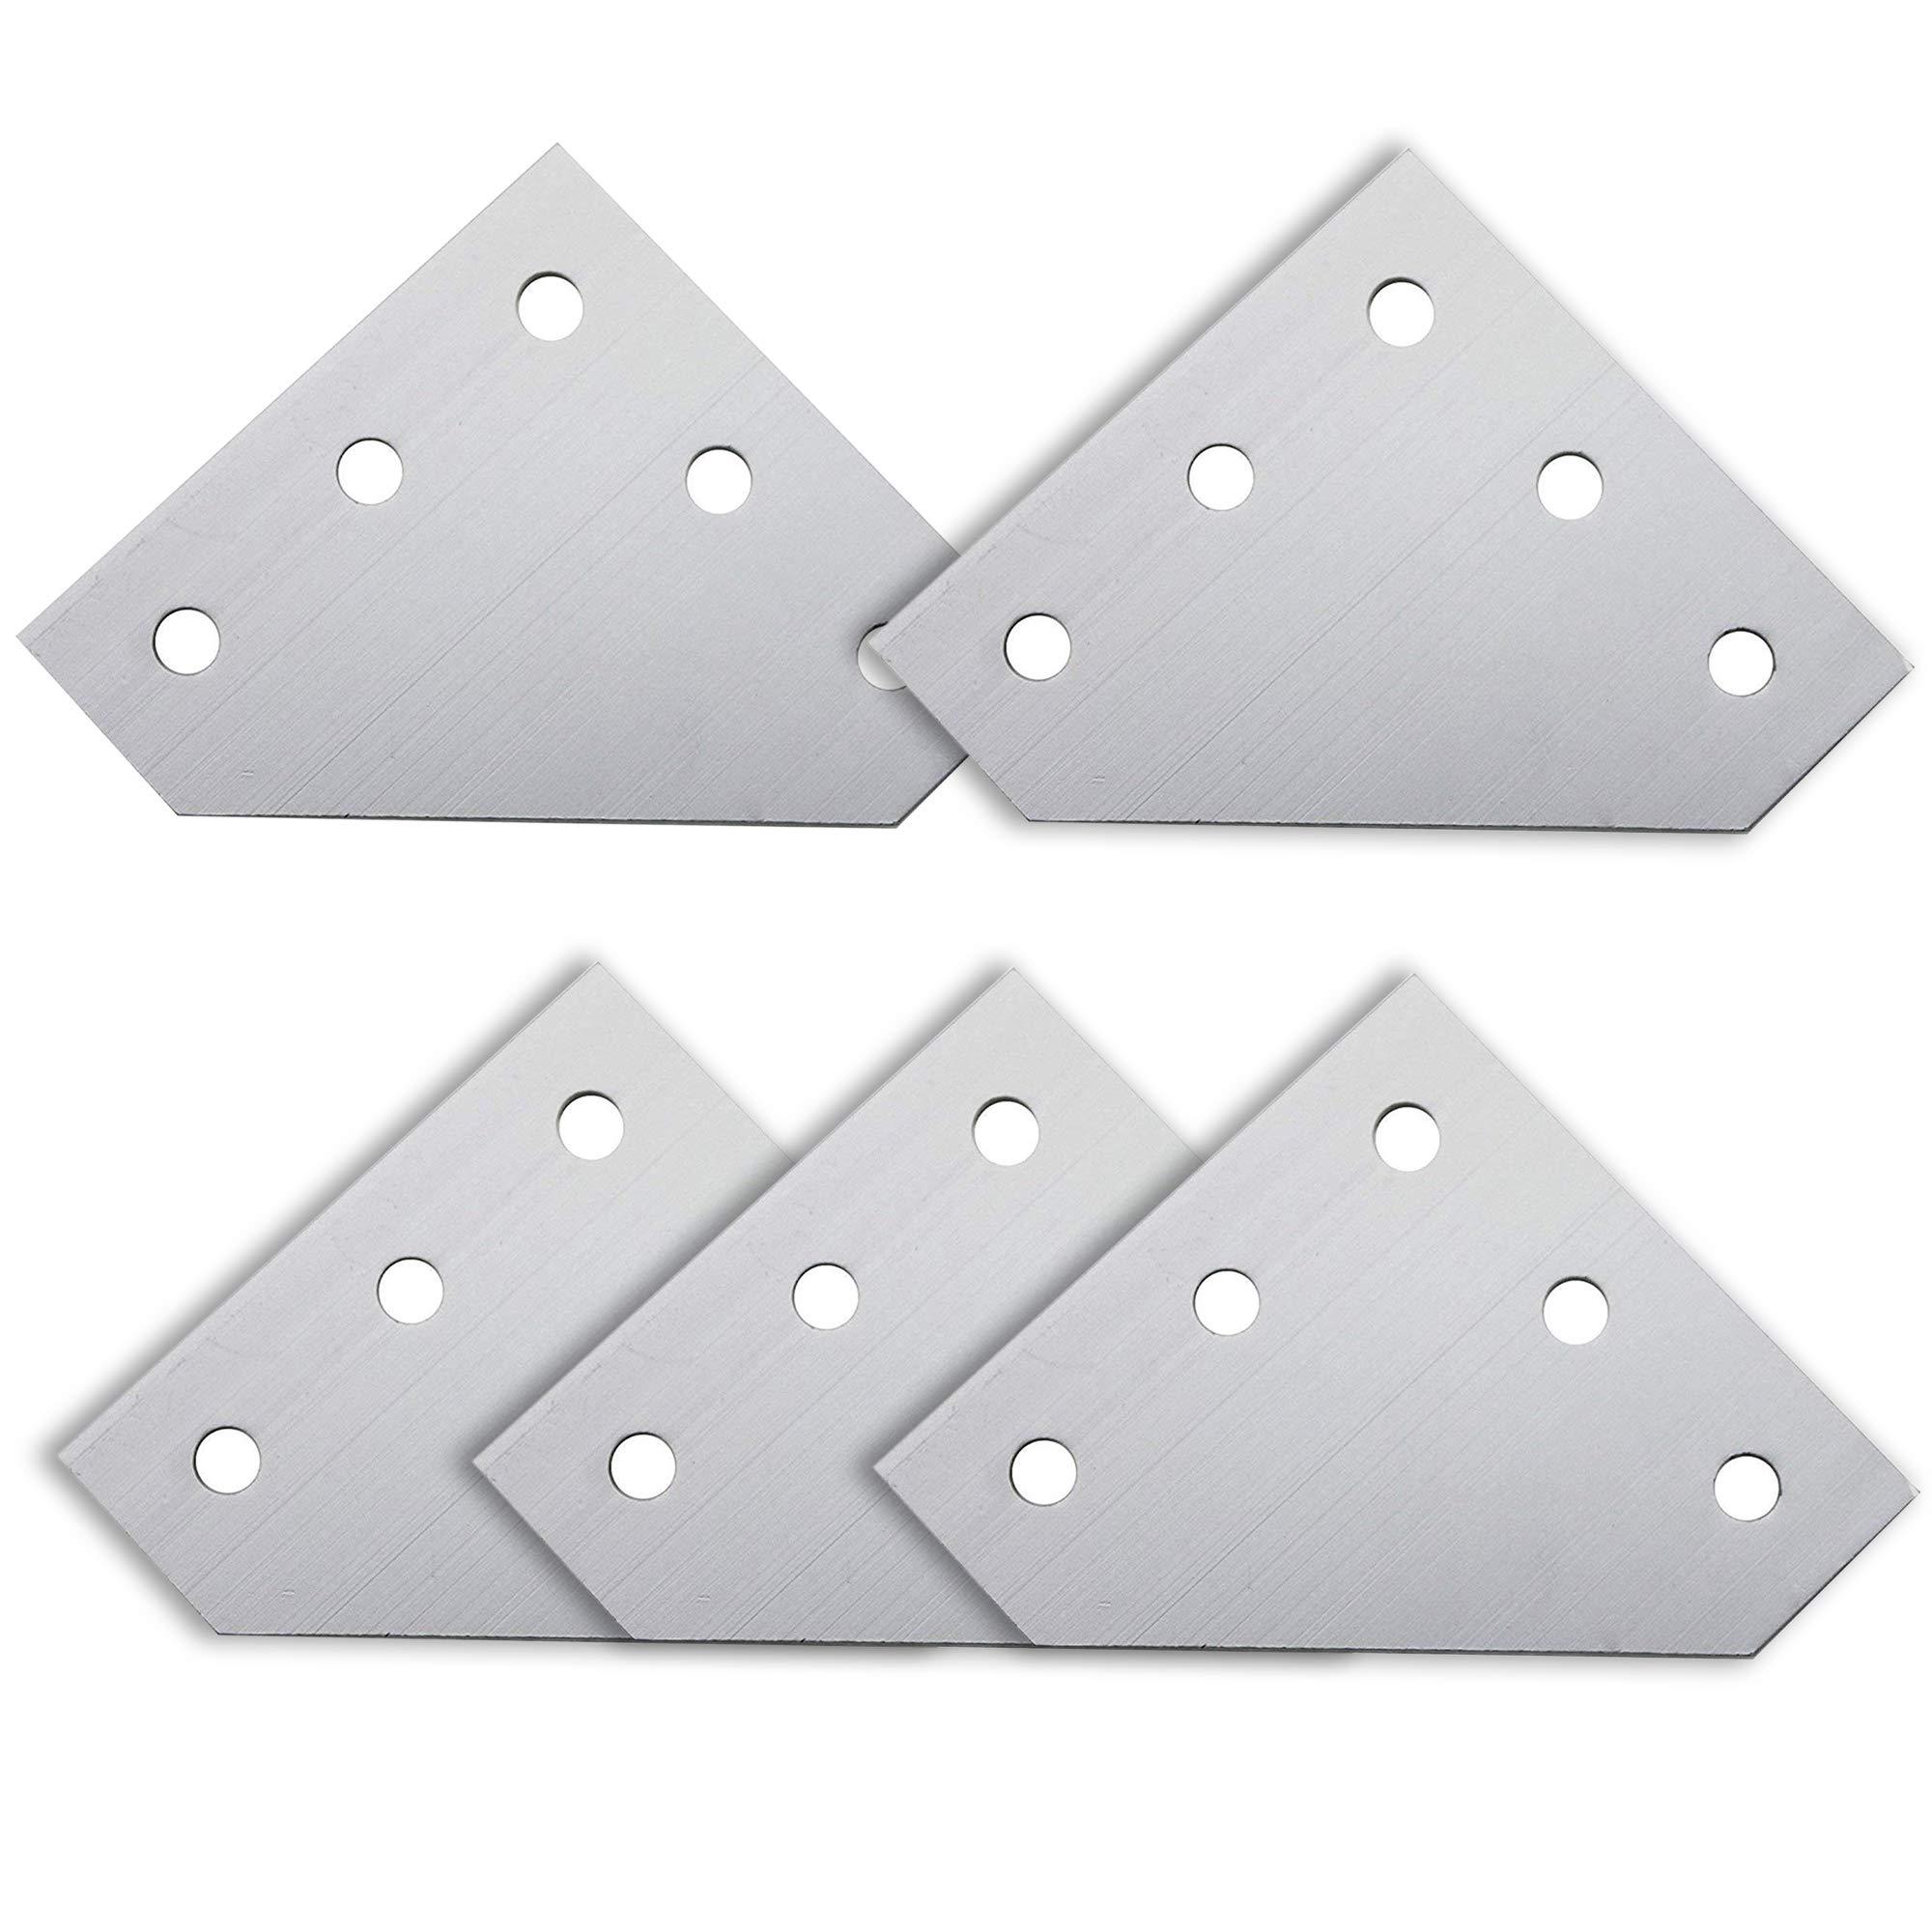 Iztoss 5-Hole 90 Degree L Shape Outside Joining Plate for 2020 Series Aluminum Profile, Joint Bracket Plate (5pcs/Pack)